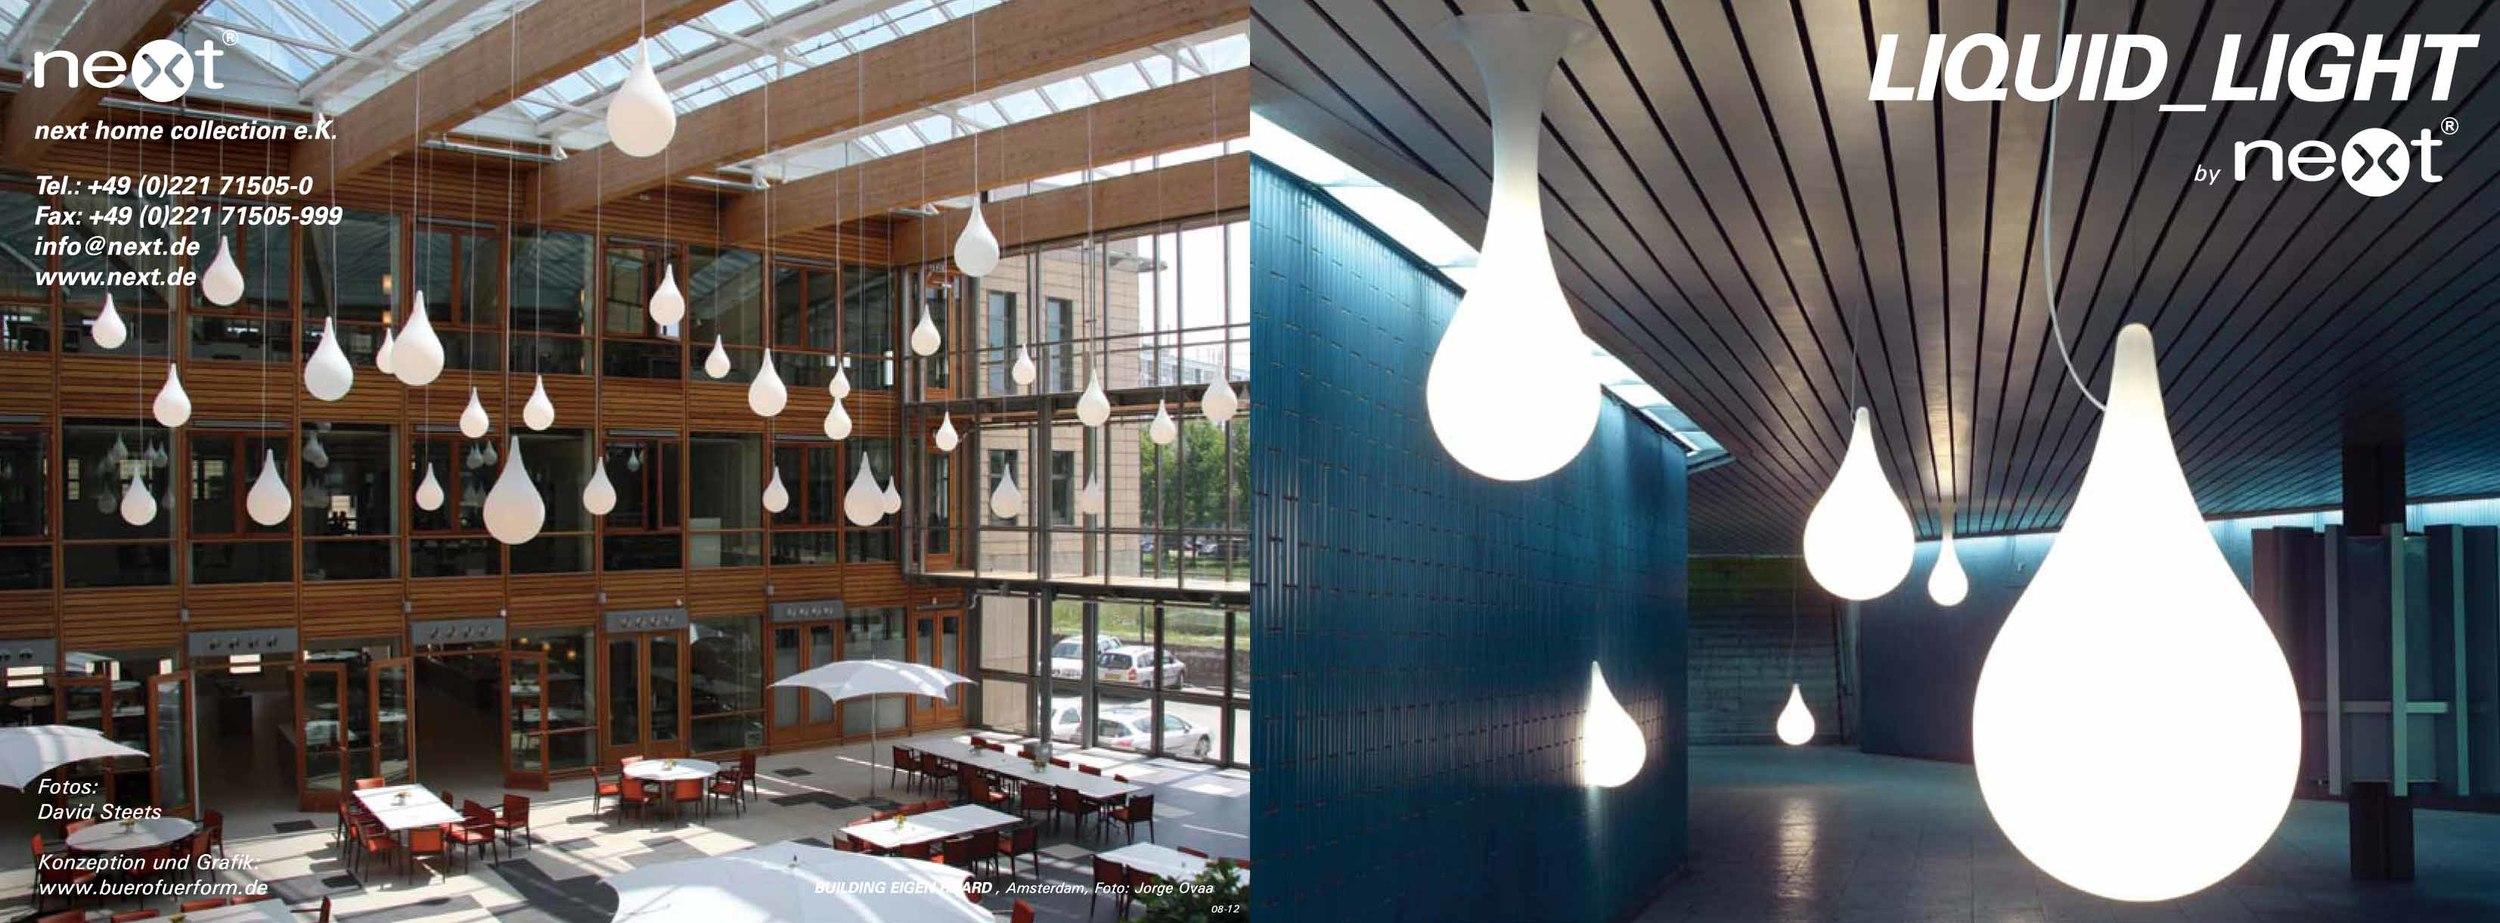 lighting next. Feature Pendant Lighting NZ_lights_Next_Liquid Light_Lighting Solutions Next